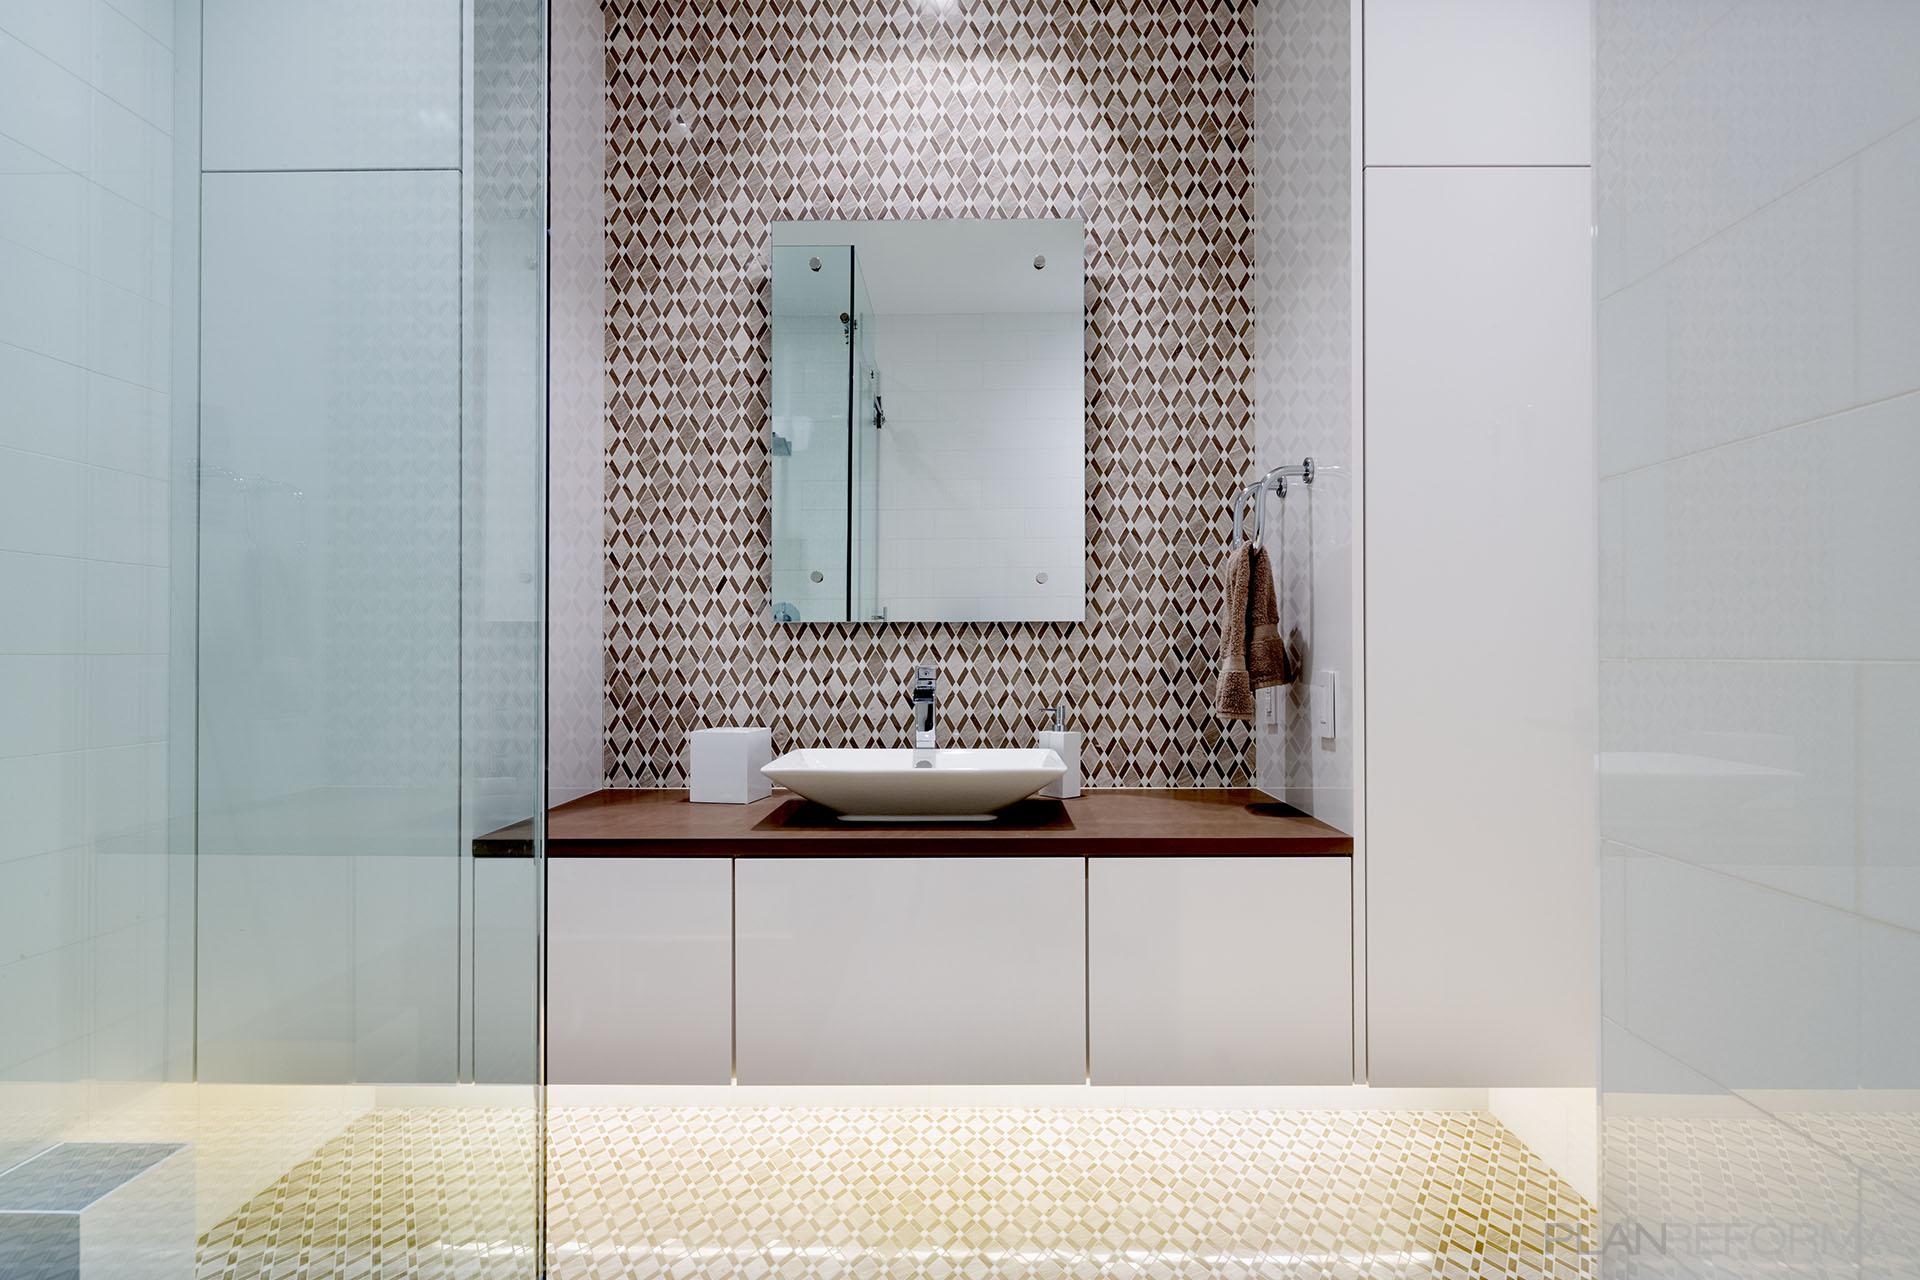 Baño Estilo moderno Color marron, marron, blanco  diseñado por DCM | Arquitecto | Copyright DCM